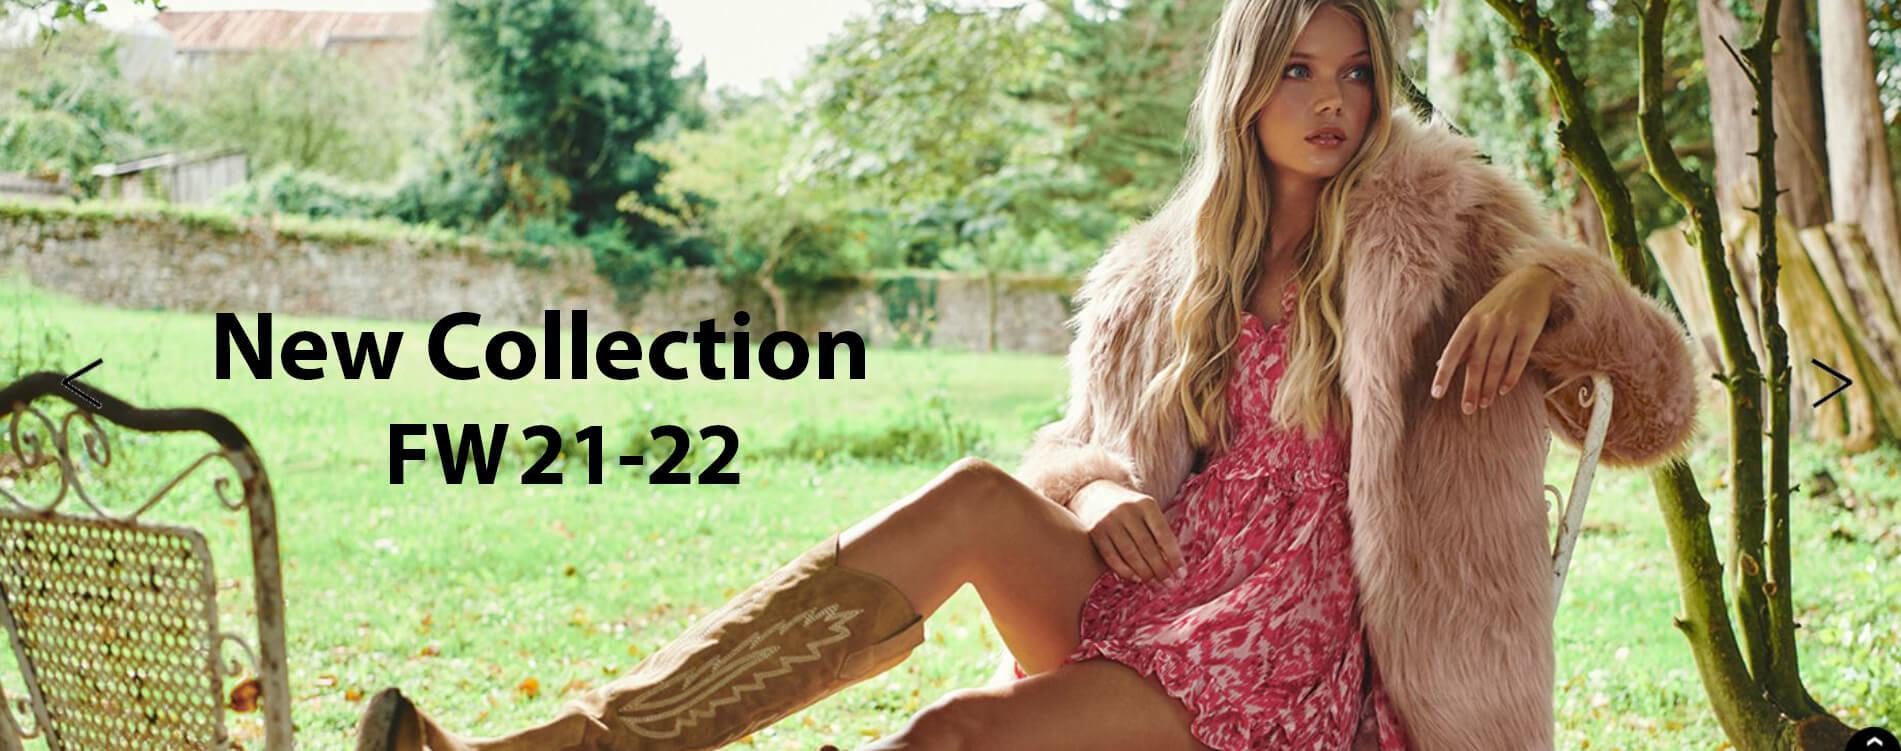 NUEVA COLECCION FETICHE SUANCES FW21